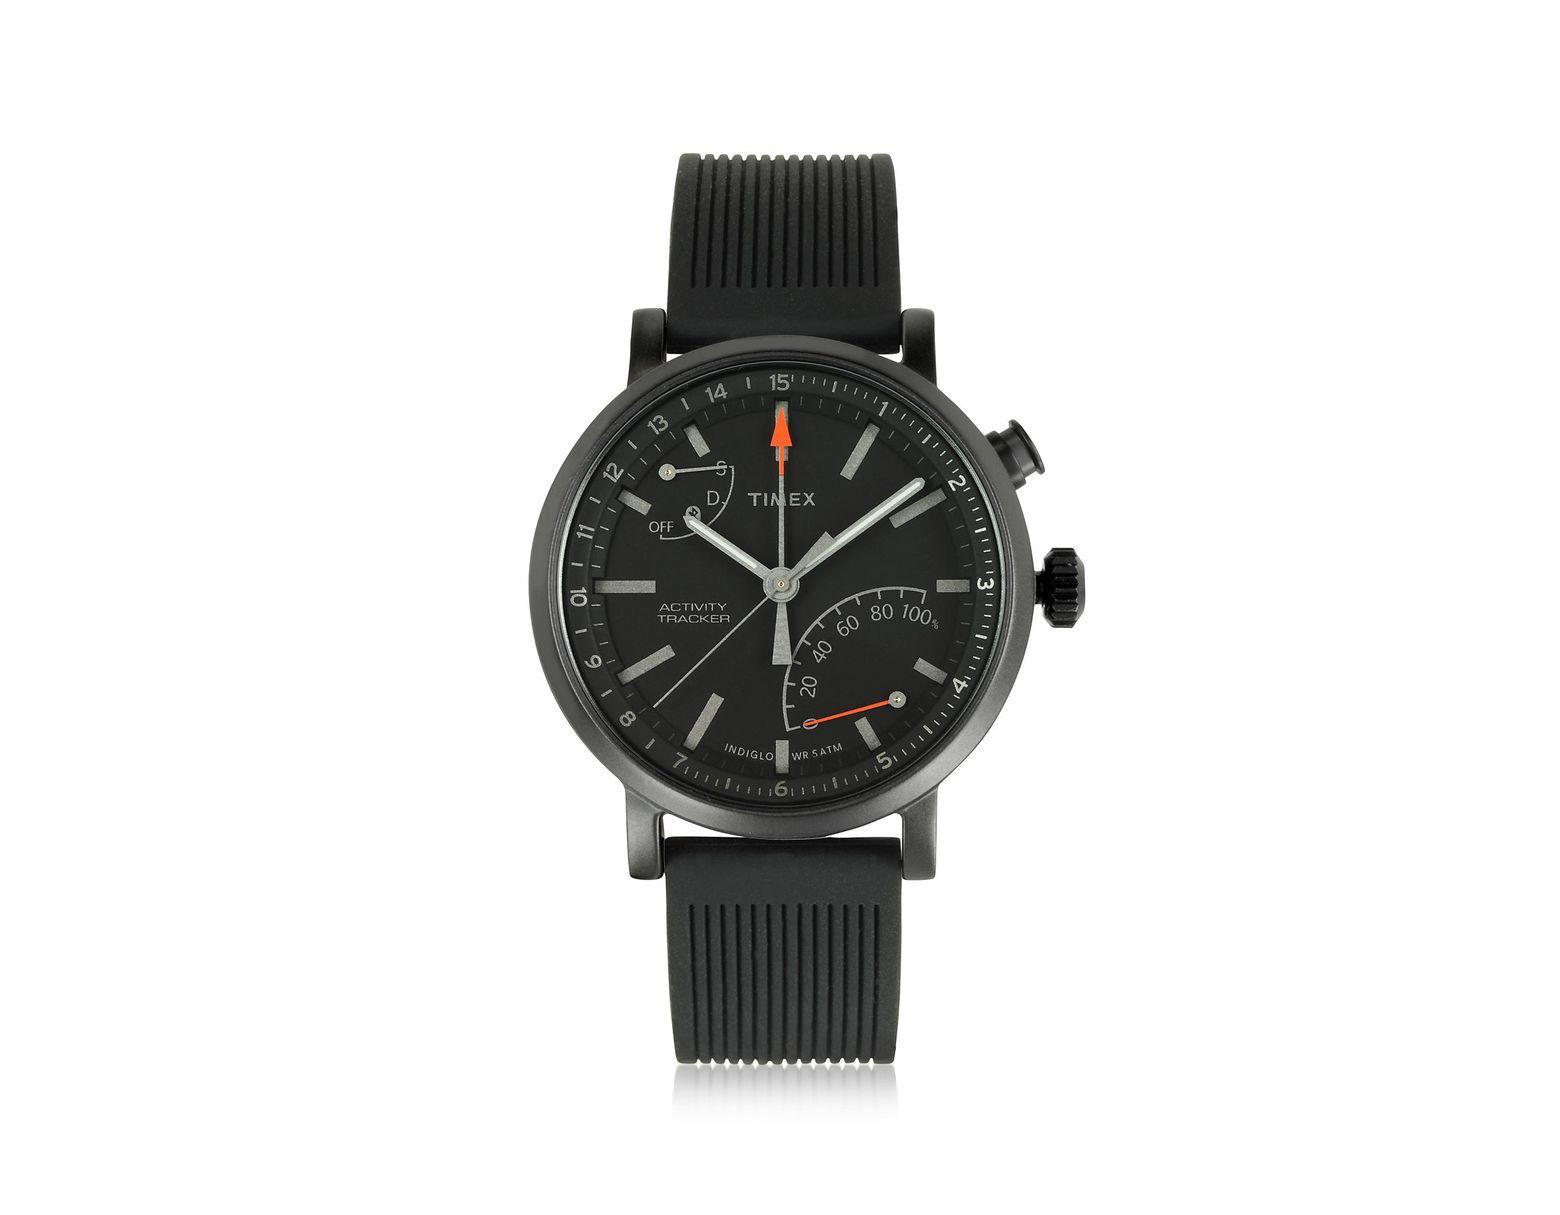 048a037a002c Metropolitan Reloj para Hombre Negro con Correa Intercambiable Timex de  hombre de color Negro - Lyst